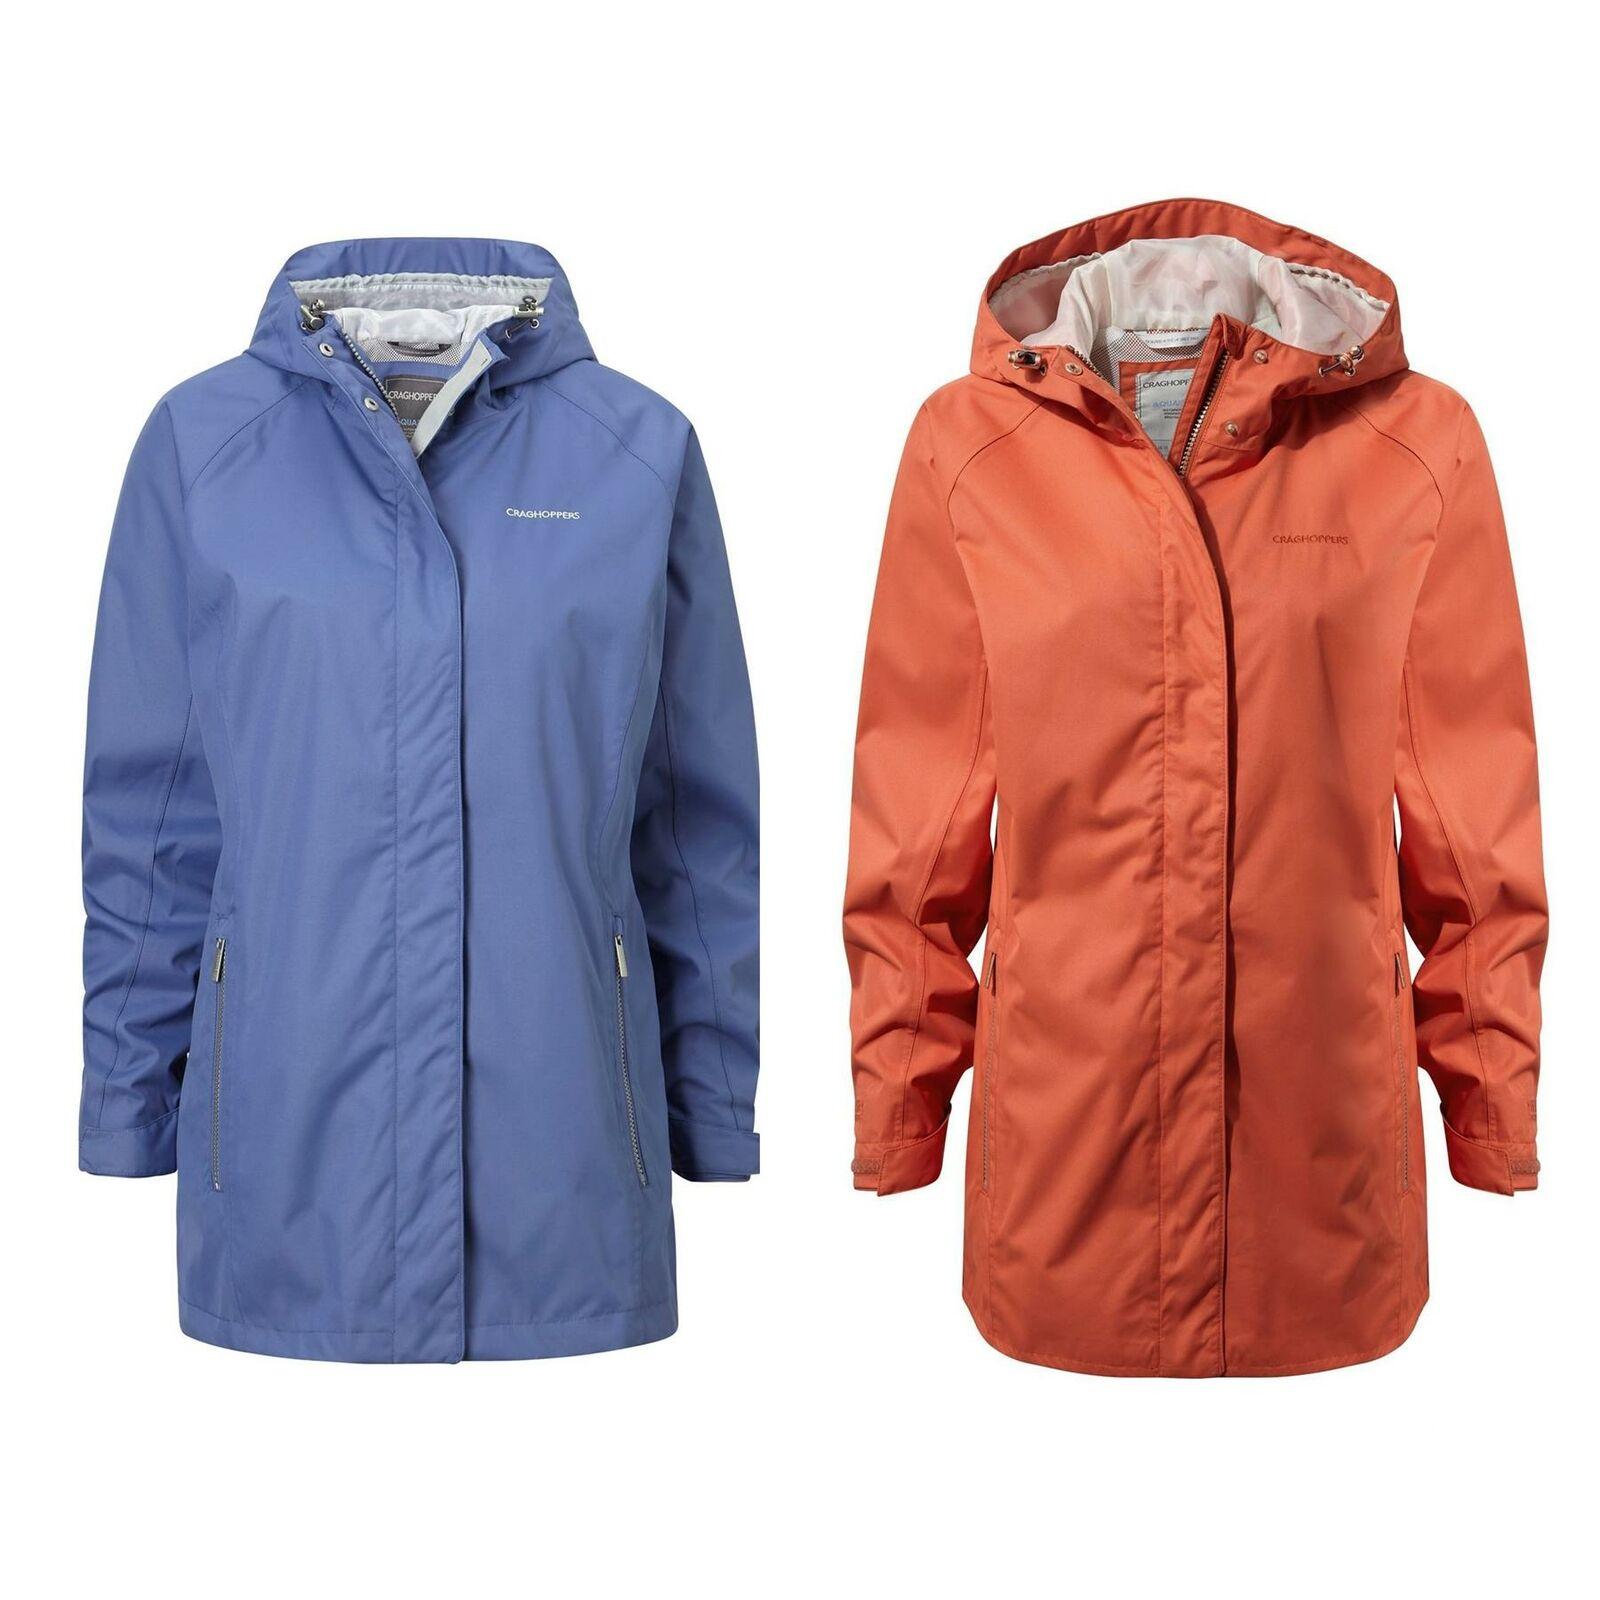 Craghoppers Madigan Classic damen Jacket Rain coat Aquadry Waterproof